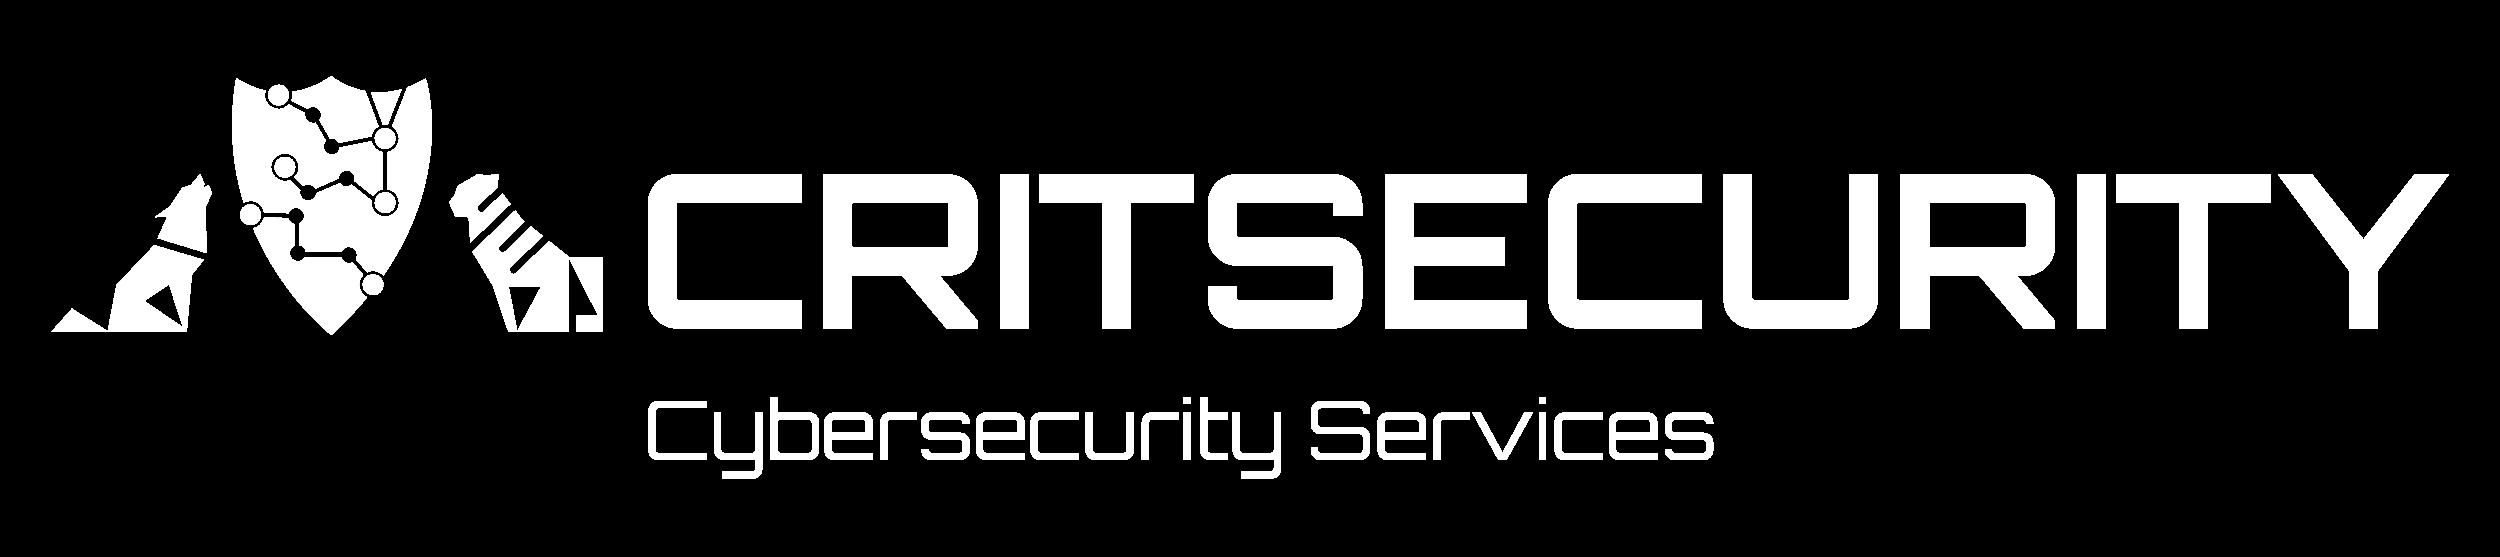 CritSecurity